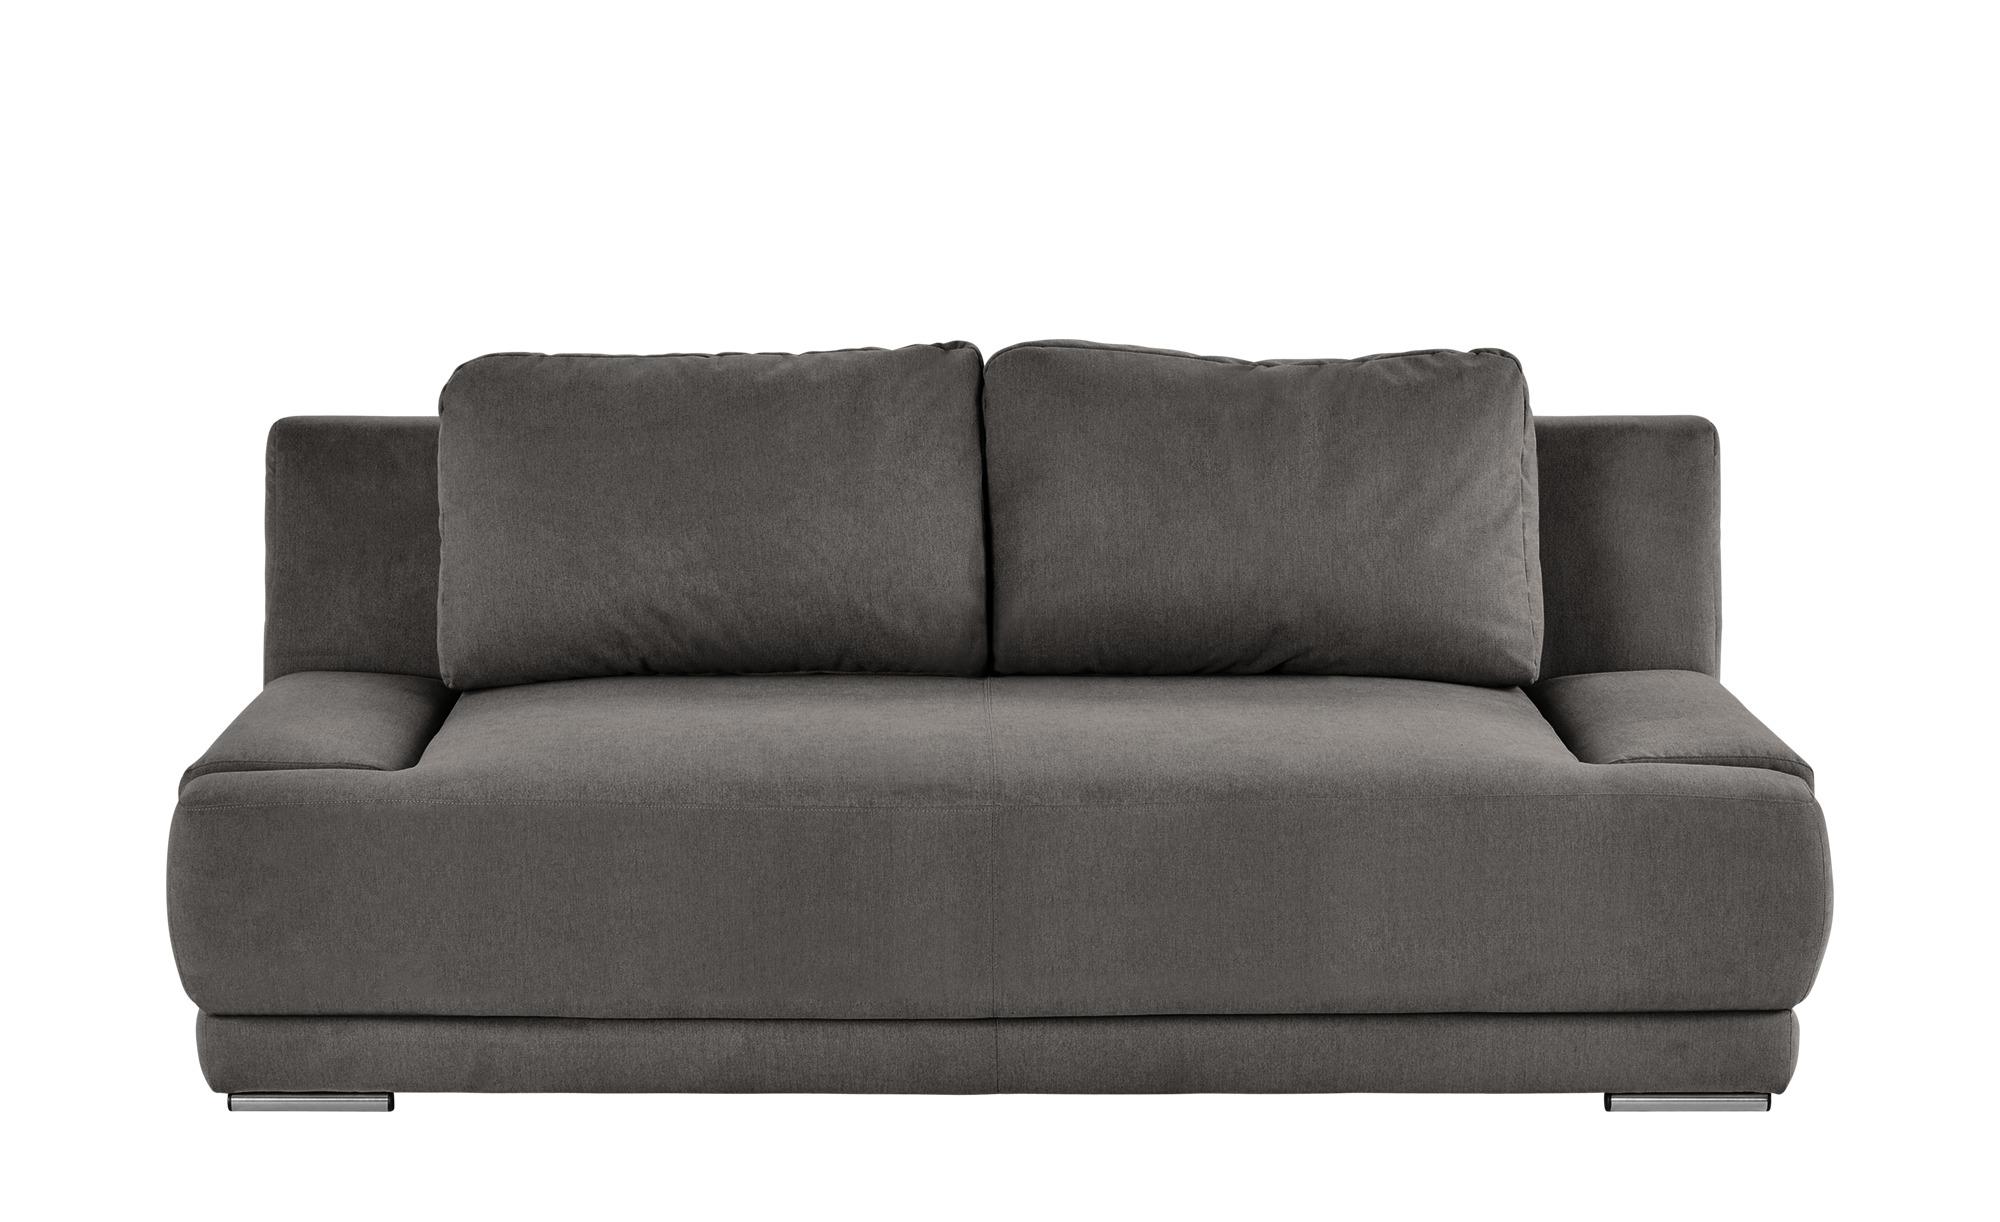 smart Schlafsofa grau-braun - Flachgewebe Regina ¦ grau ¦ Maße (cm): B: 206 H: 83 T: 98 Polstermöbel > Sofas > 2-Sitzer - Höffner